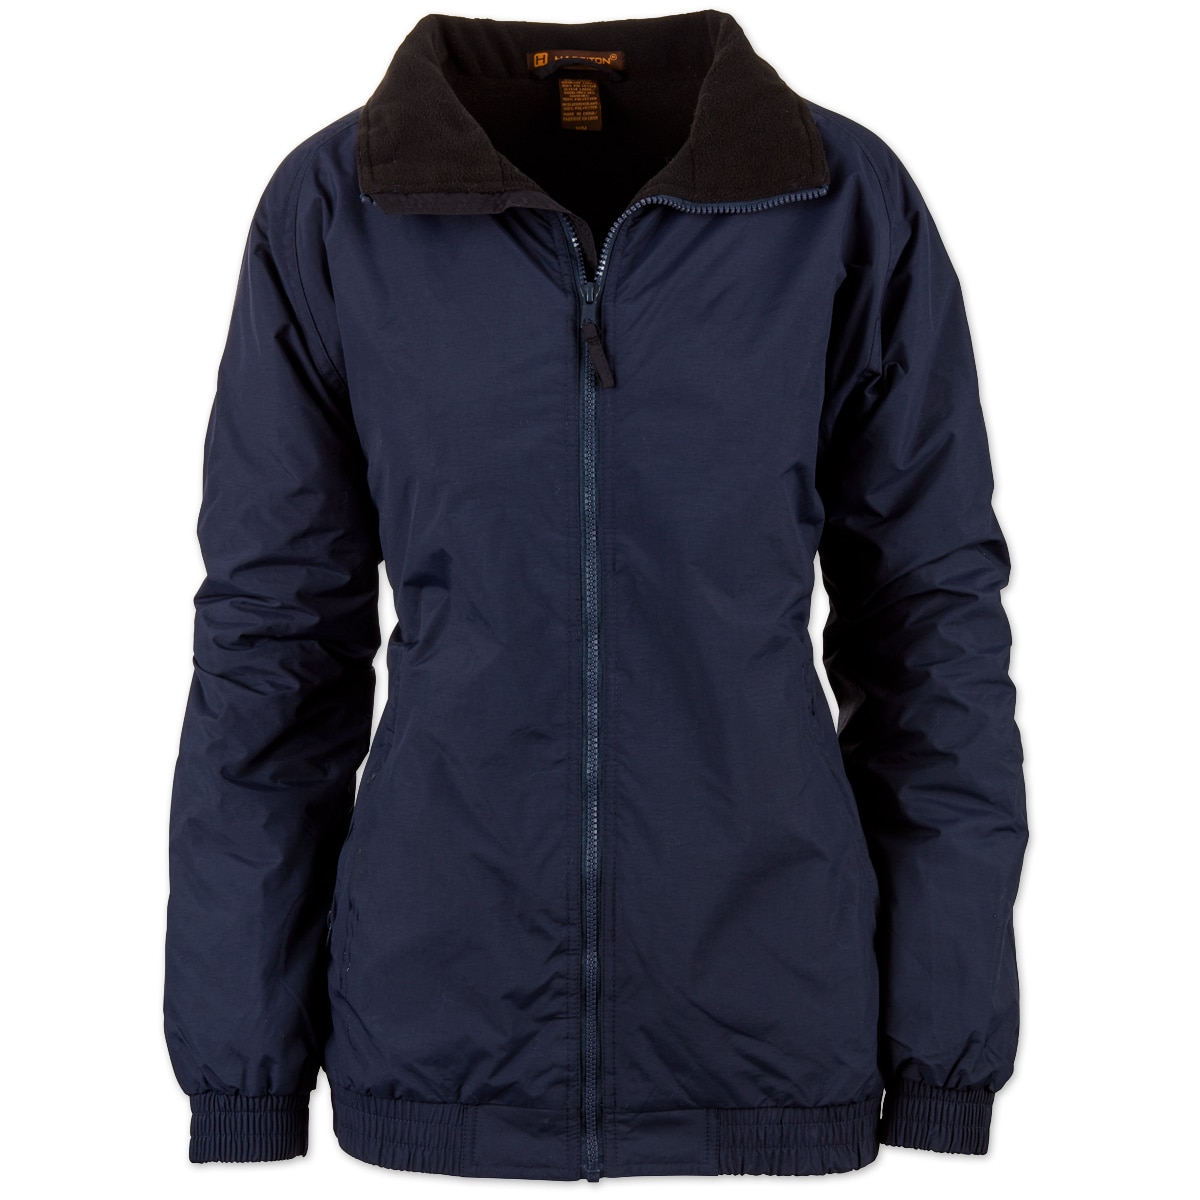 307458f13 Personalized Fleece Lined Nylon Jacket